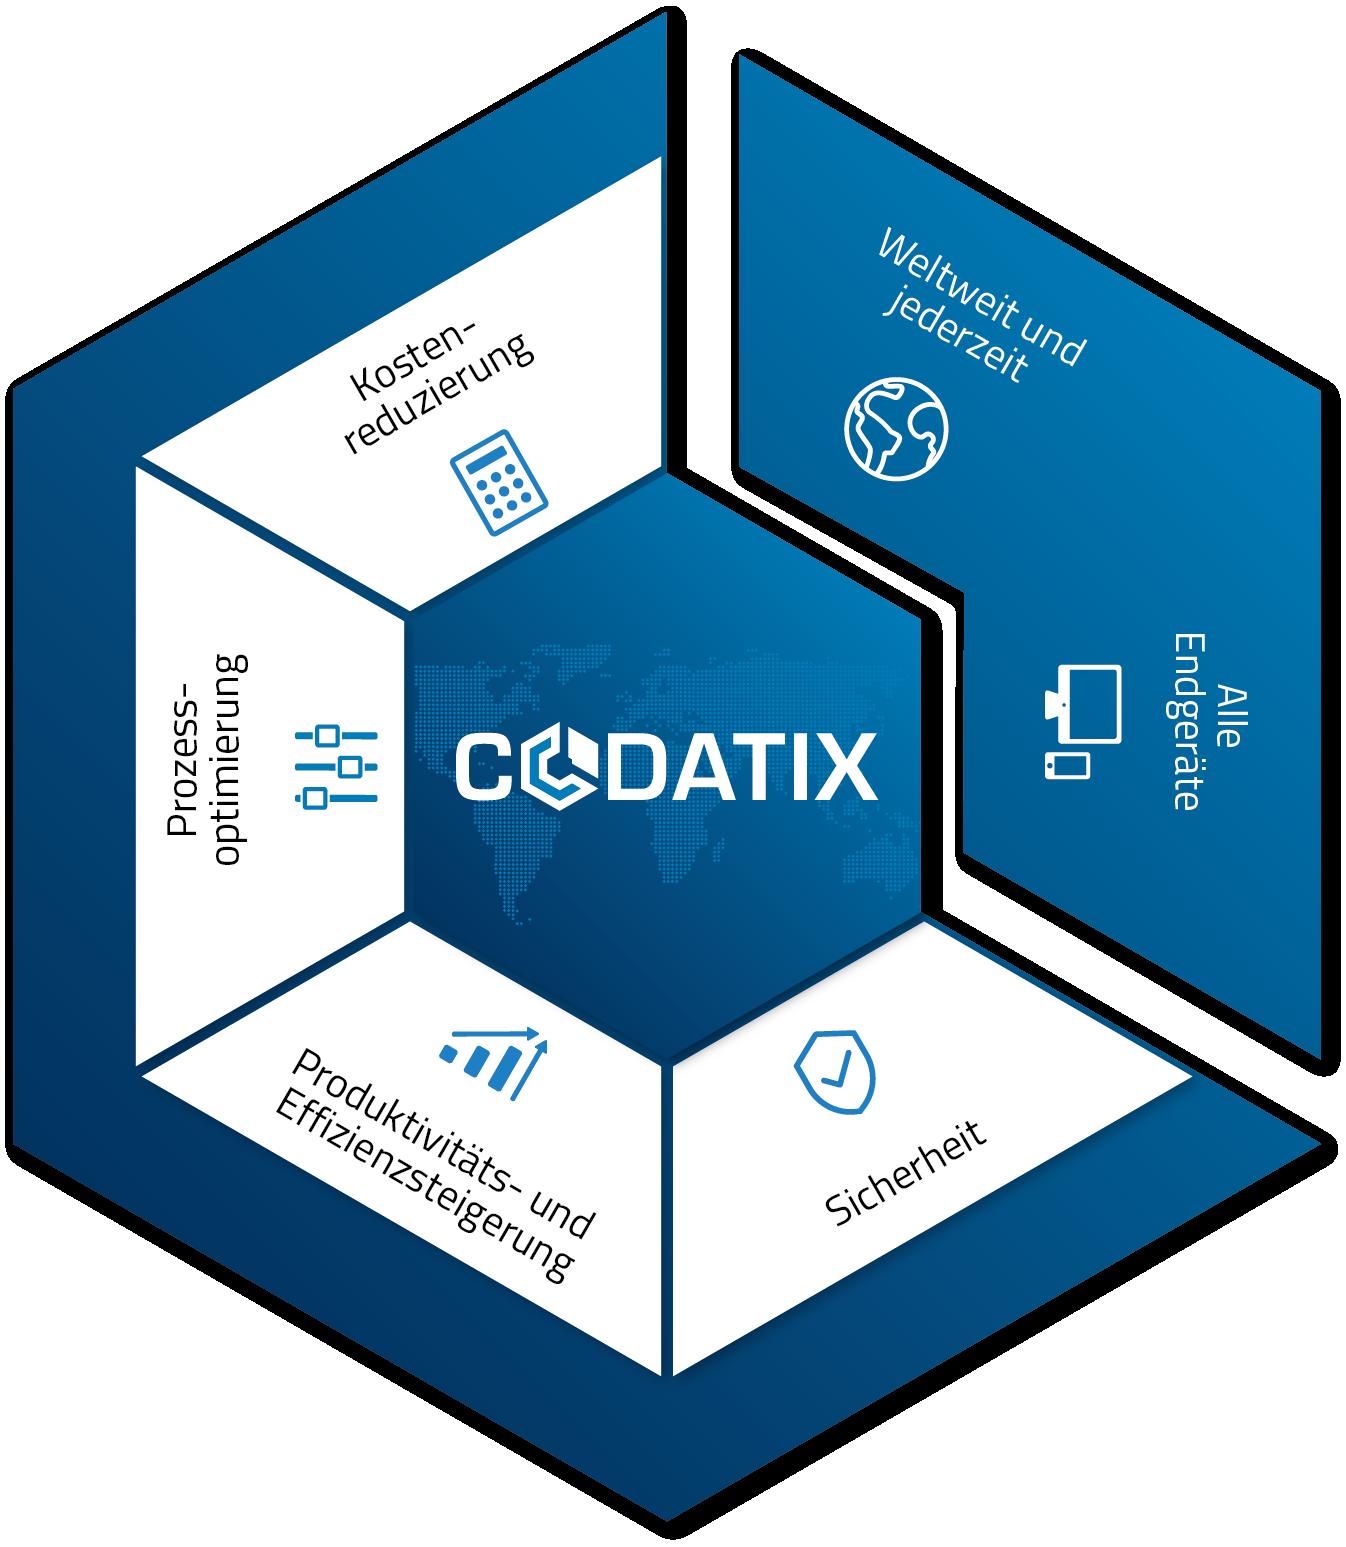 CODATIX_BigPicture_DE